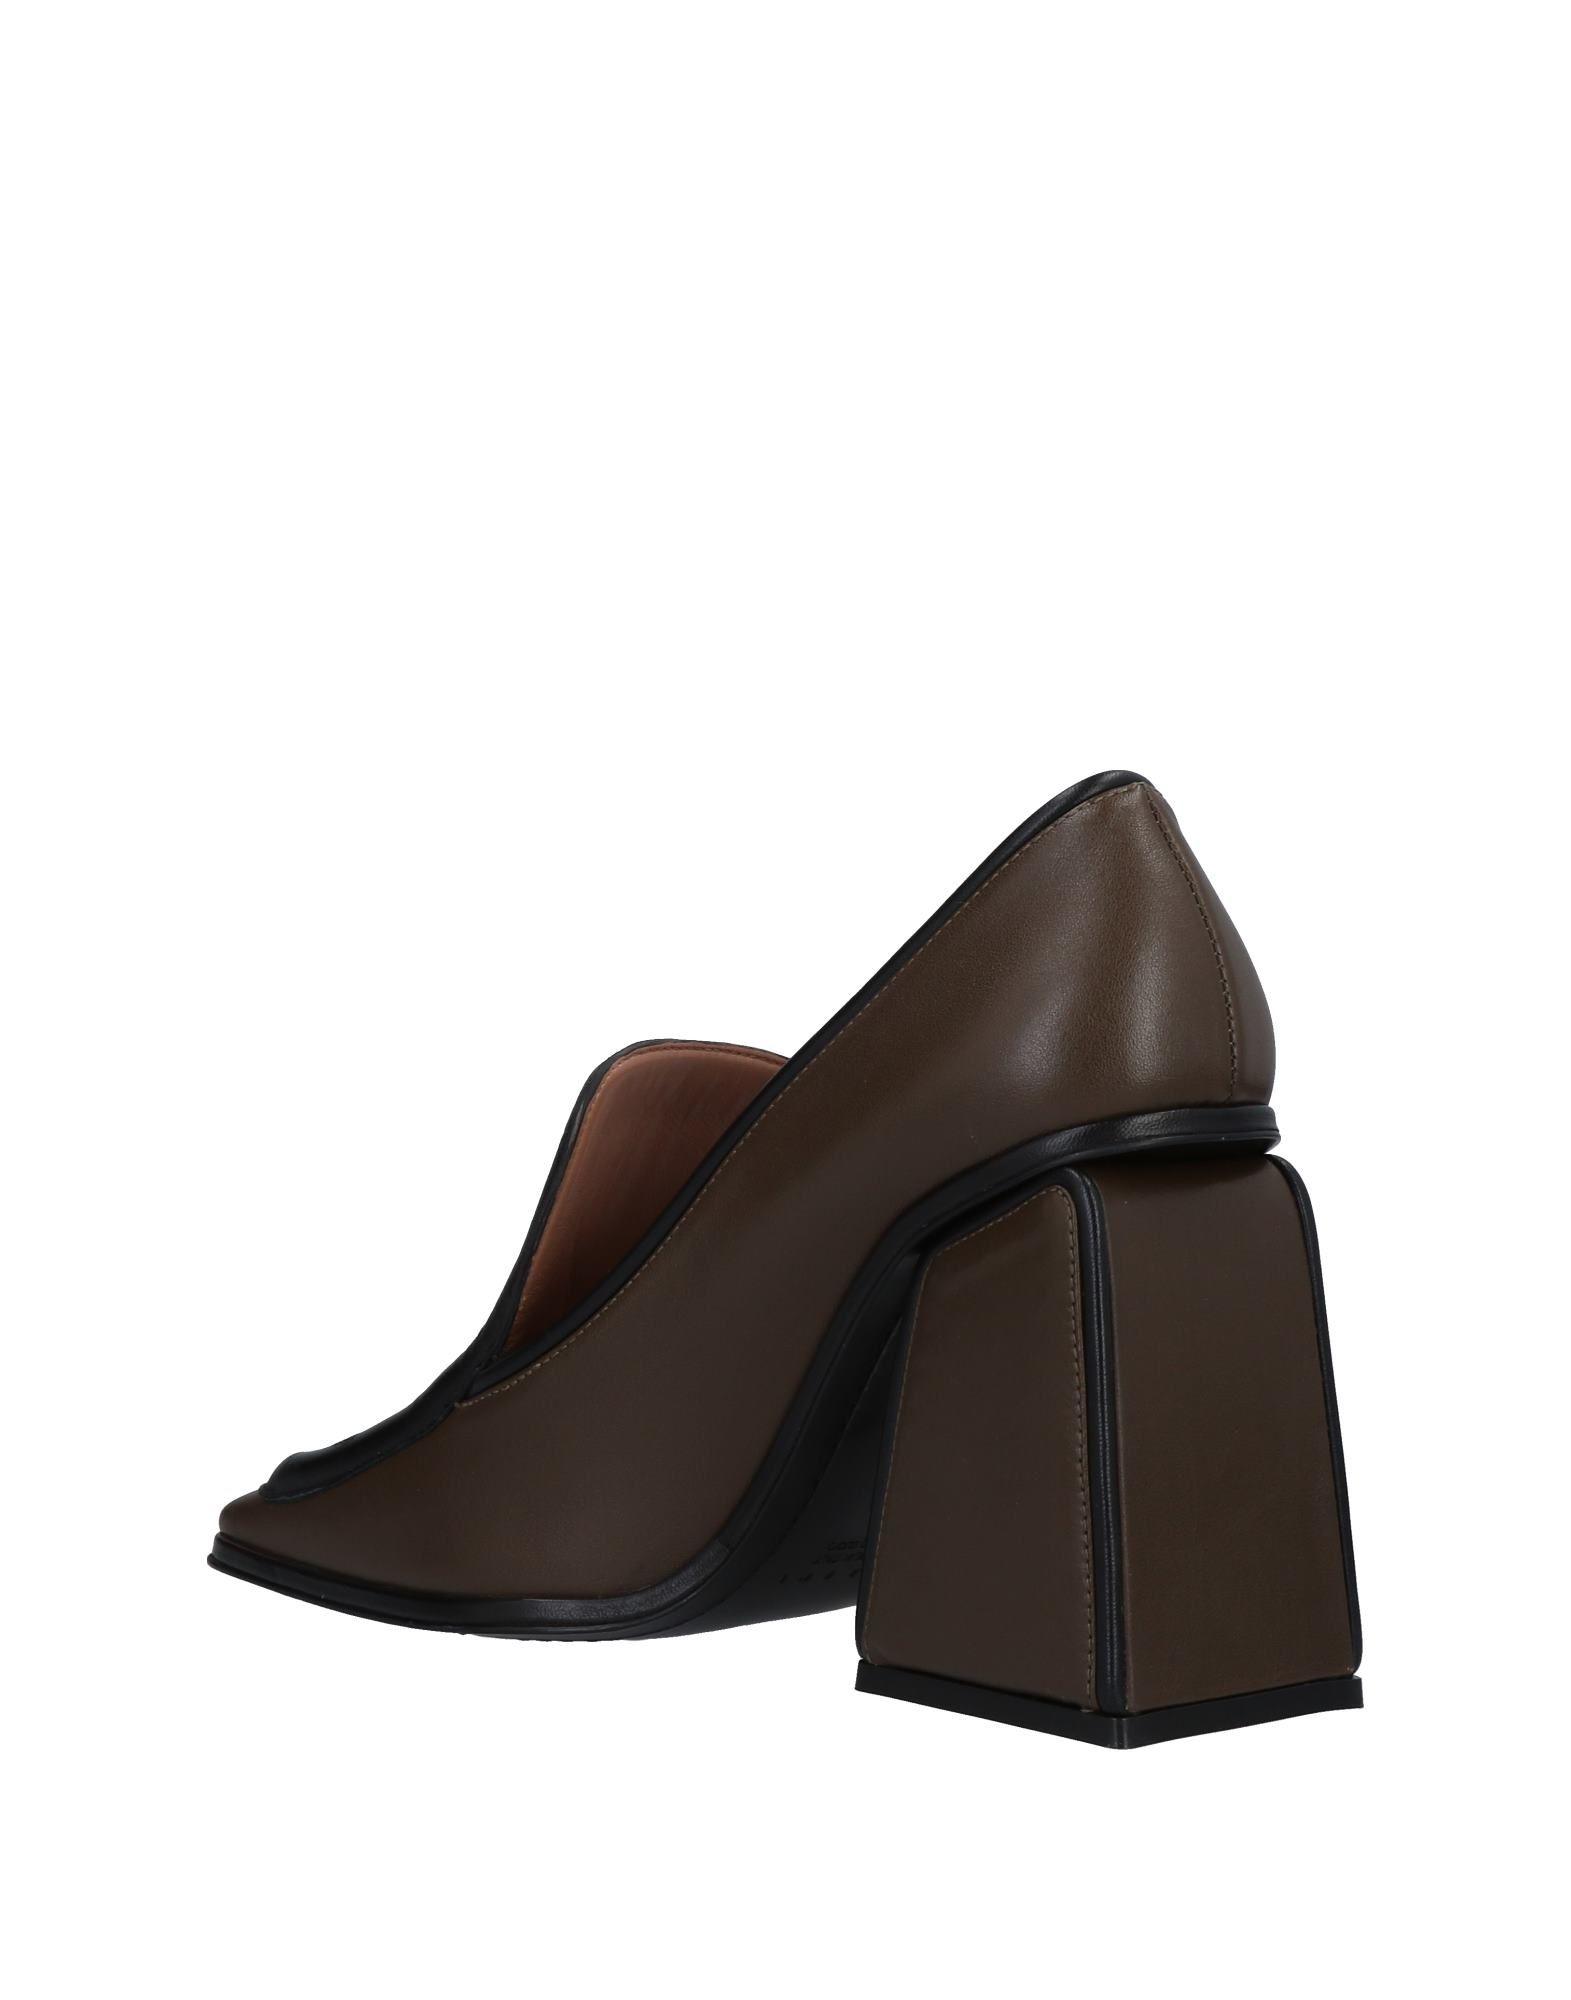 Marni  Mokassins Damen  Marni 11481241OC Heiße Schuhe 3bdec3